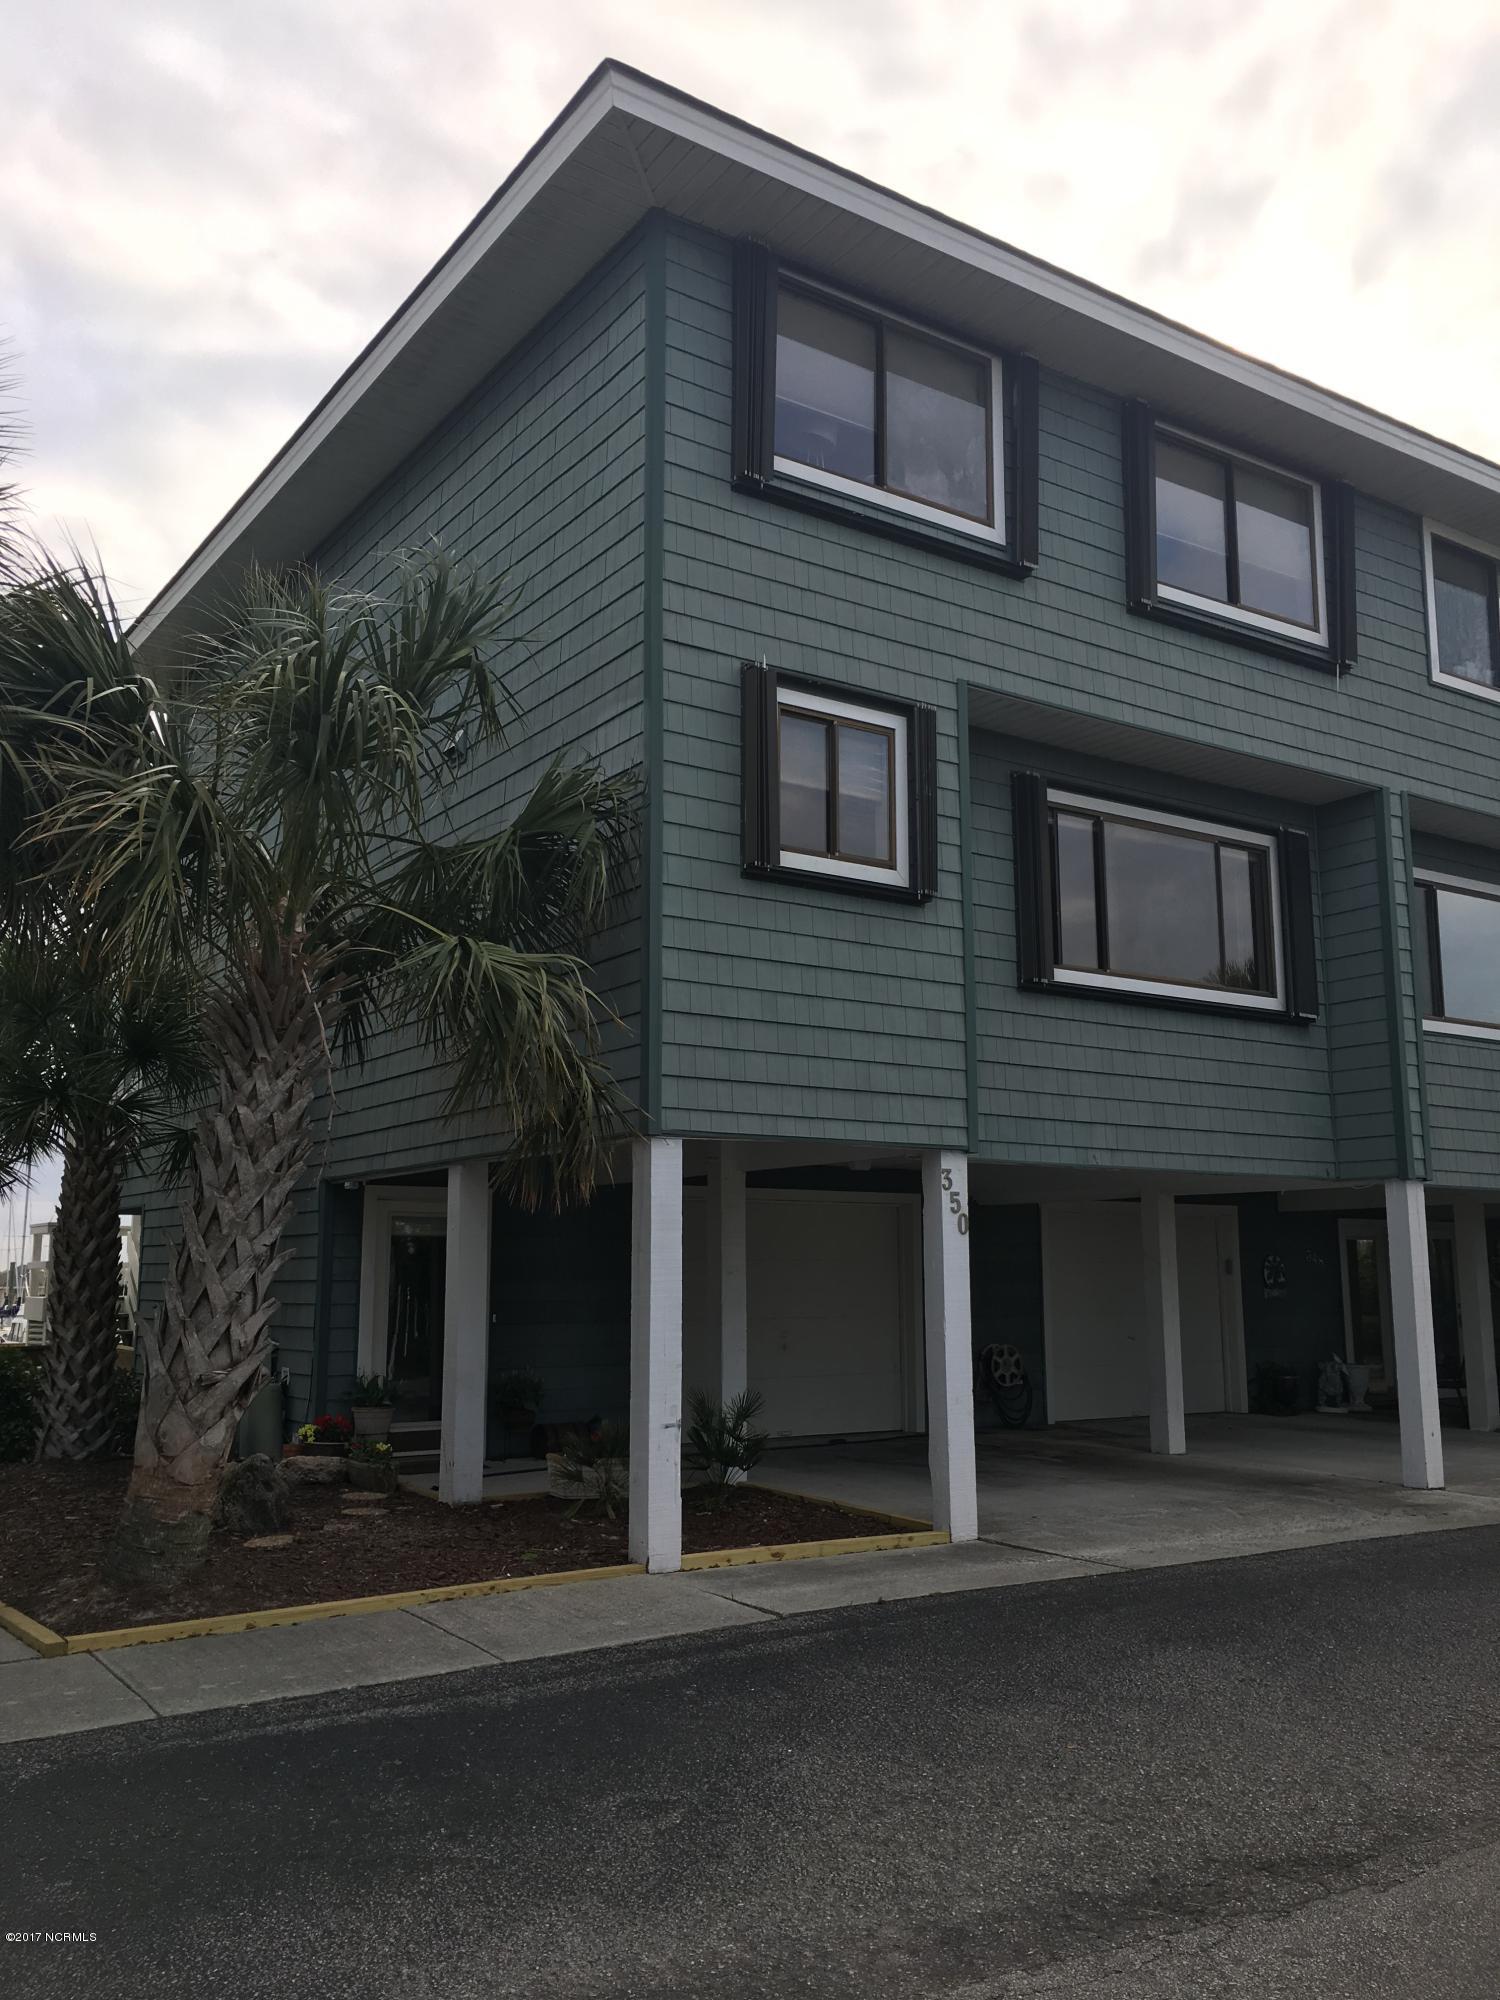 350 Causeway Drive, Wrightsville Beach, North Carolina, 3 Bedrooms Bedrooms, 6 Rooms Rooms,2 BathroomsBathrooms,Condominium,For sale,Causeway,100058526